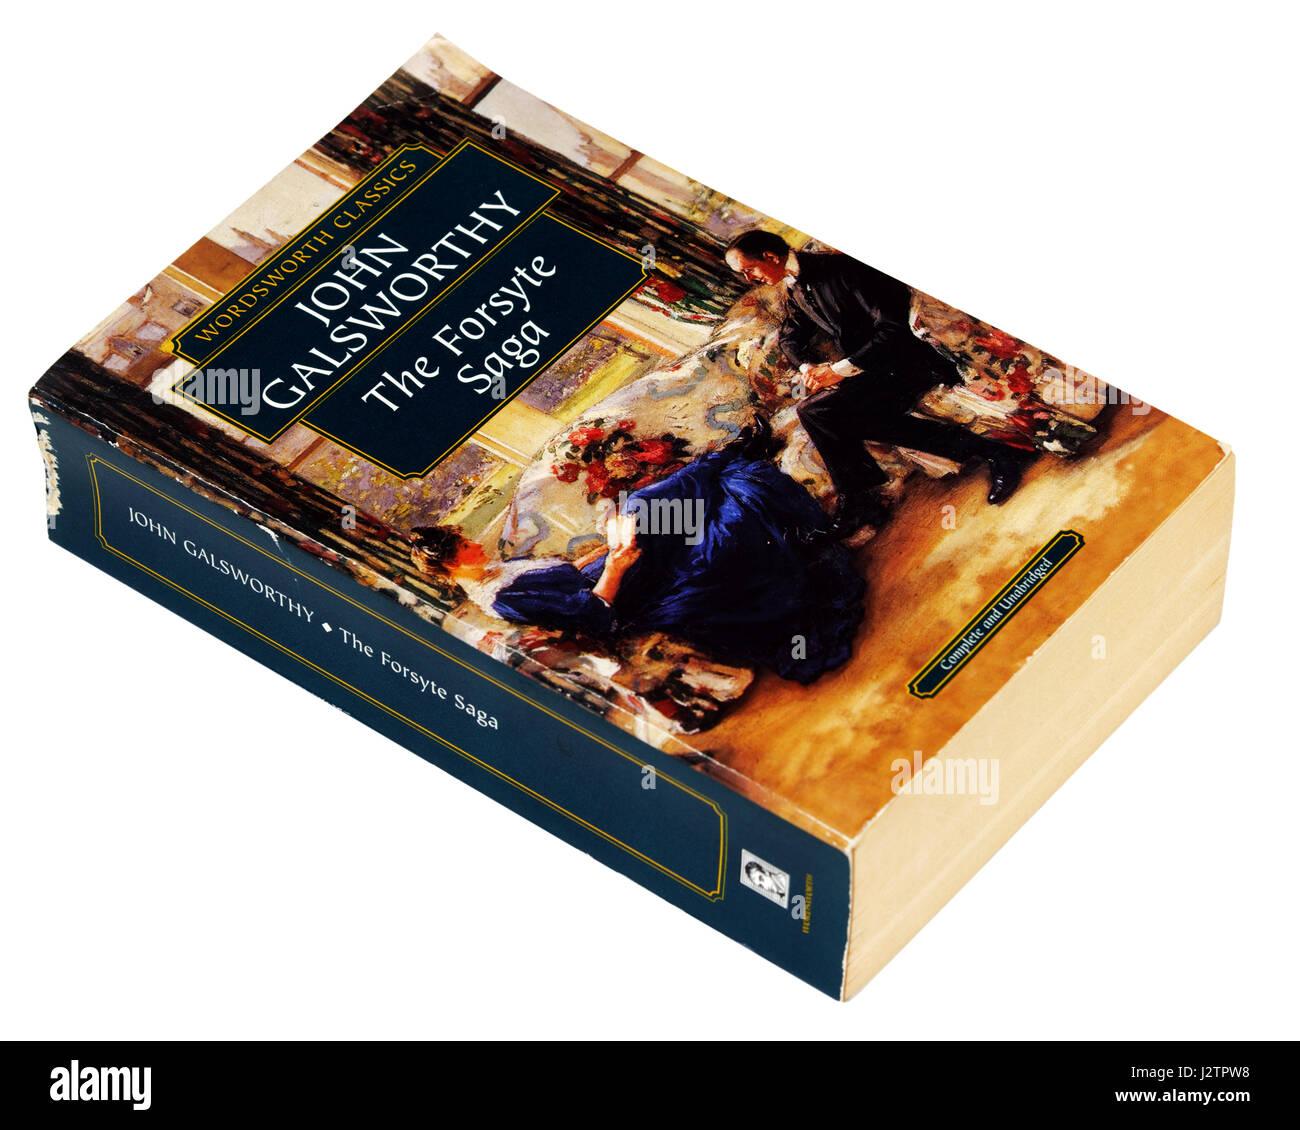 The Forsyte Saga by JohnGalsworthy - Stock Image